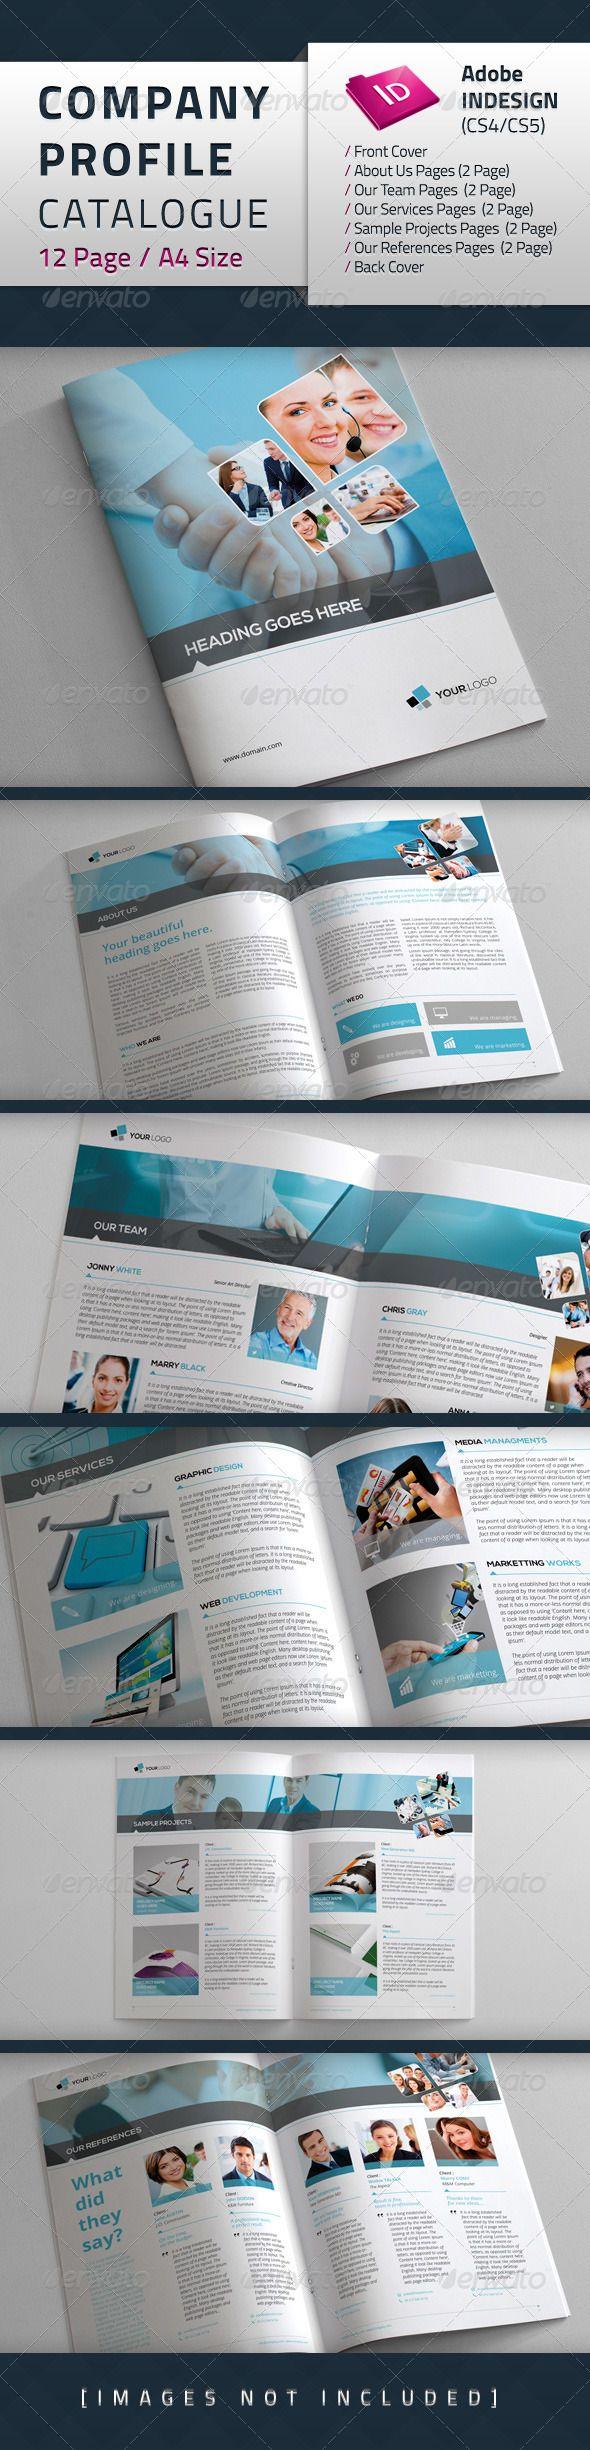 Company Profile Catalogue – Free Business Profile Template